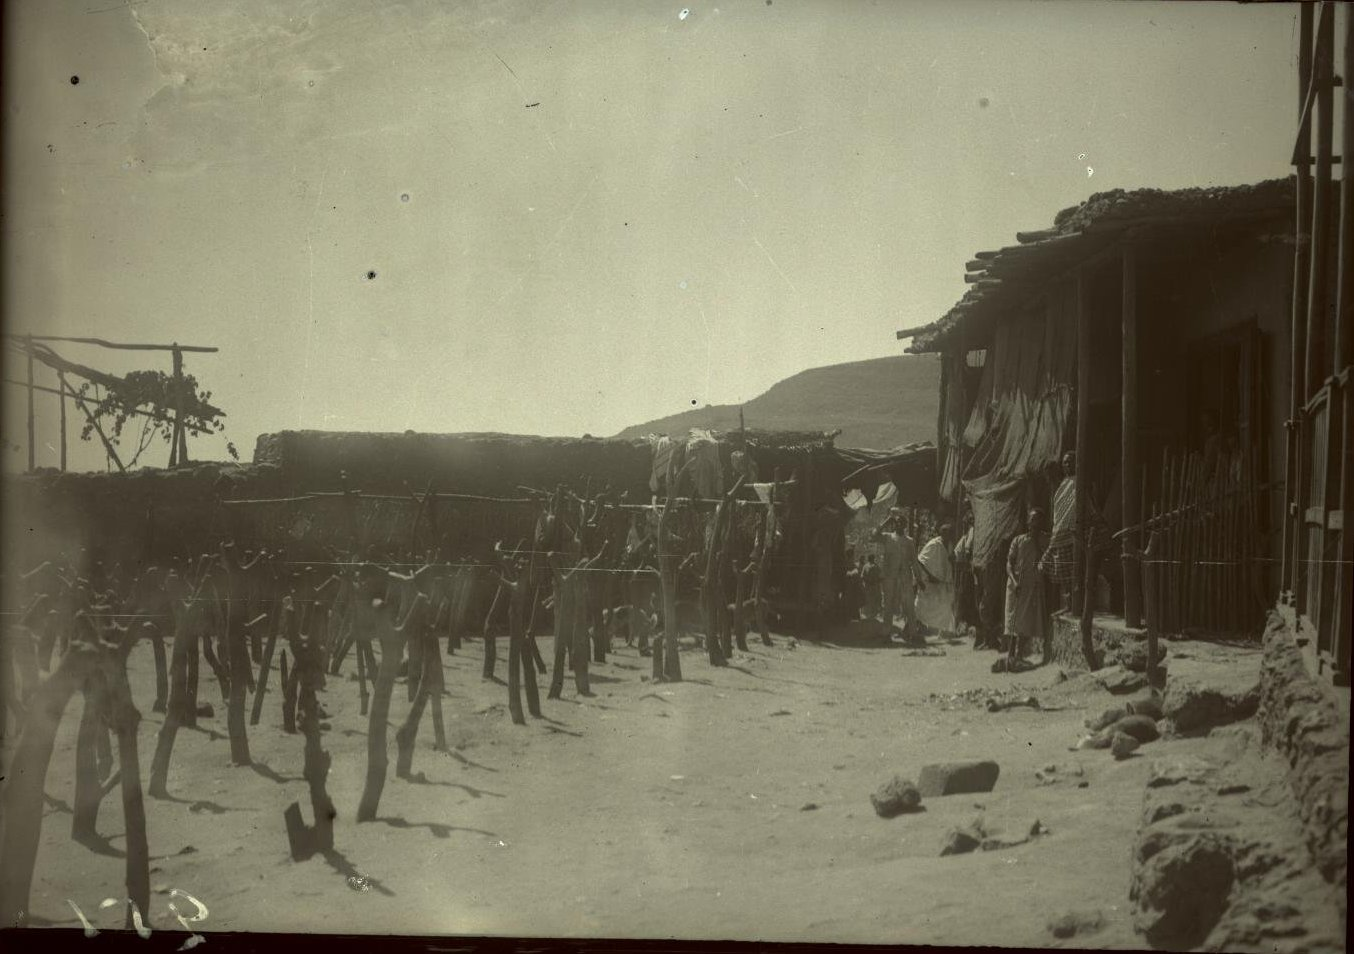 251. Абиссиния, провинция Харар, г. Харар. Мясной рынок